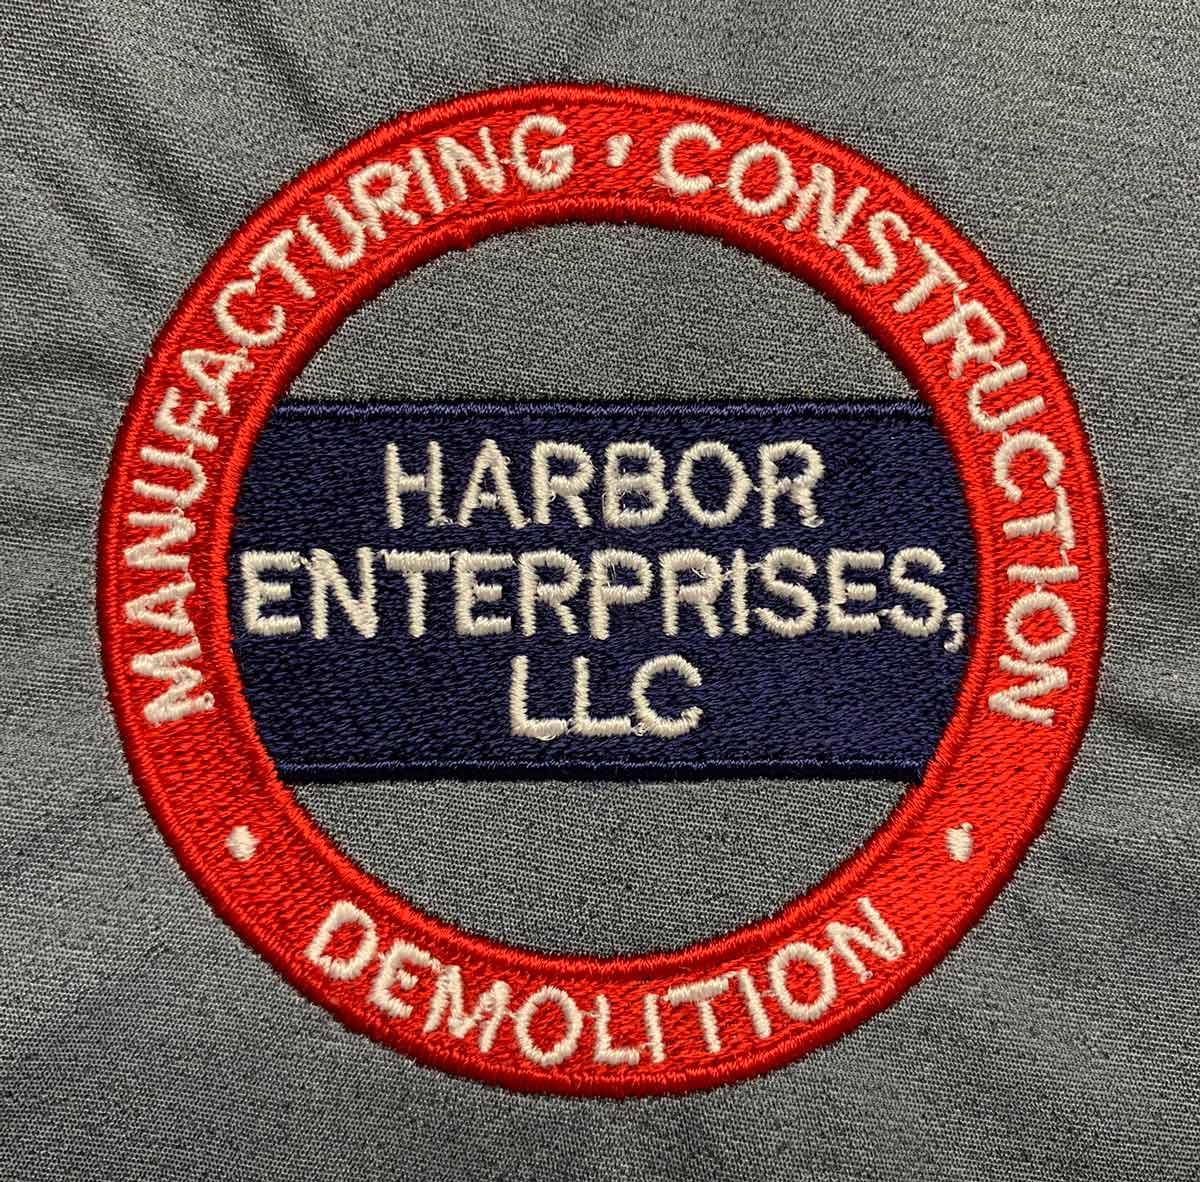 KYC_HARBOR-ENTERPRISES-LLC_web.jpg